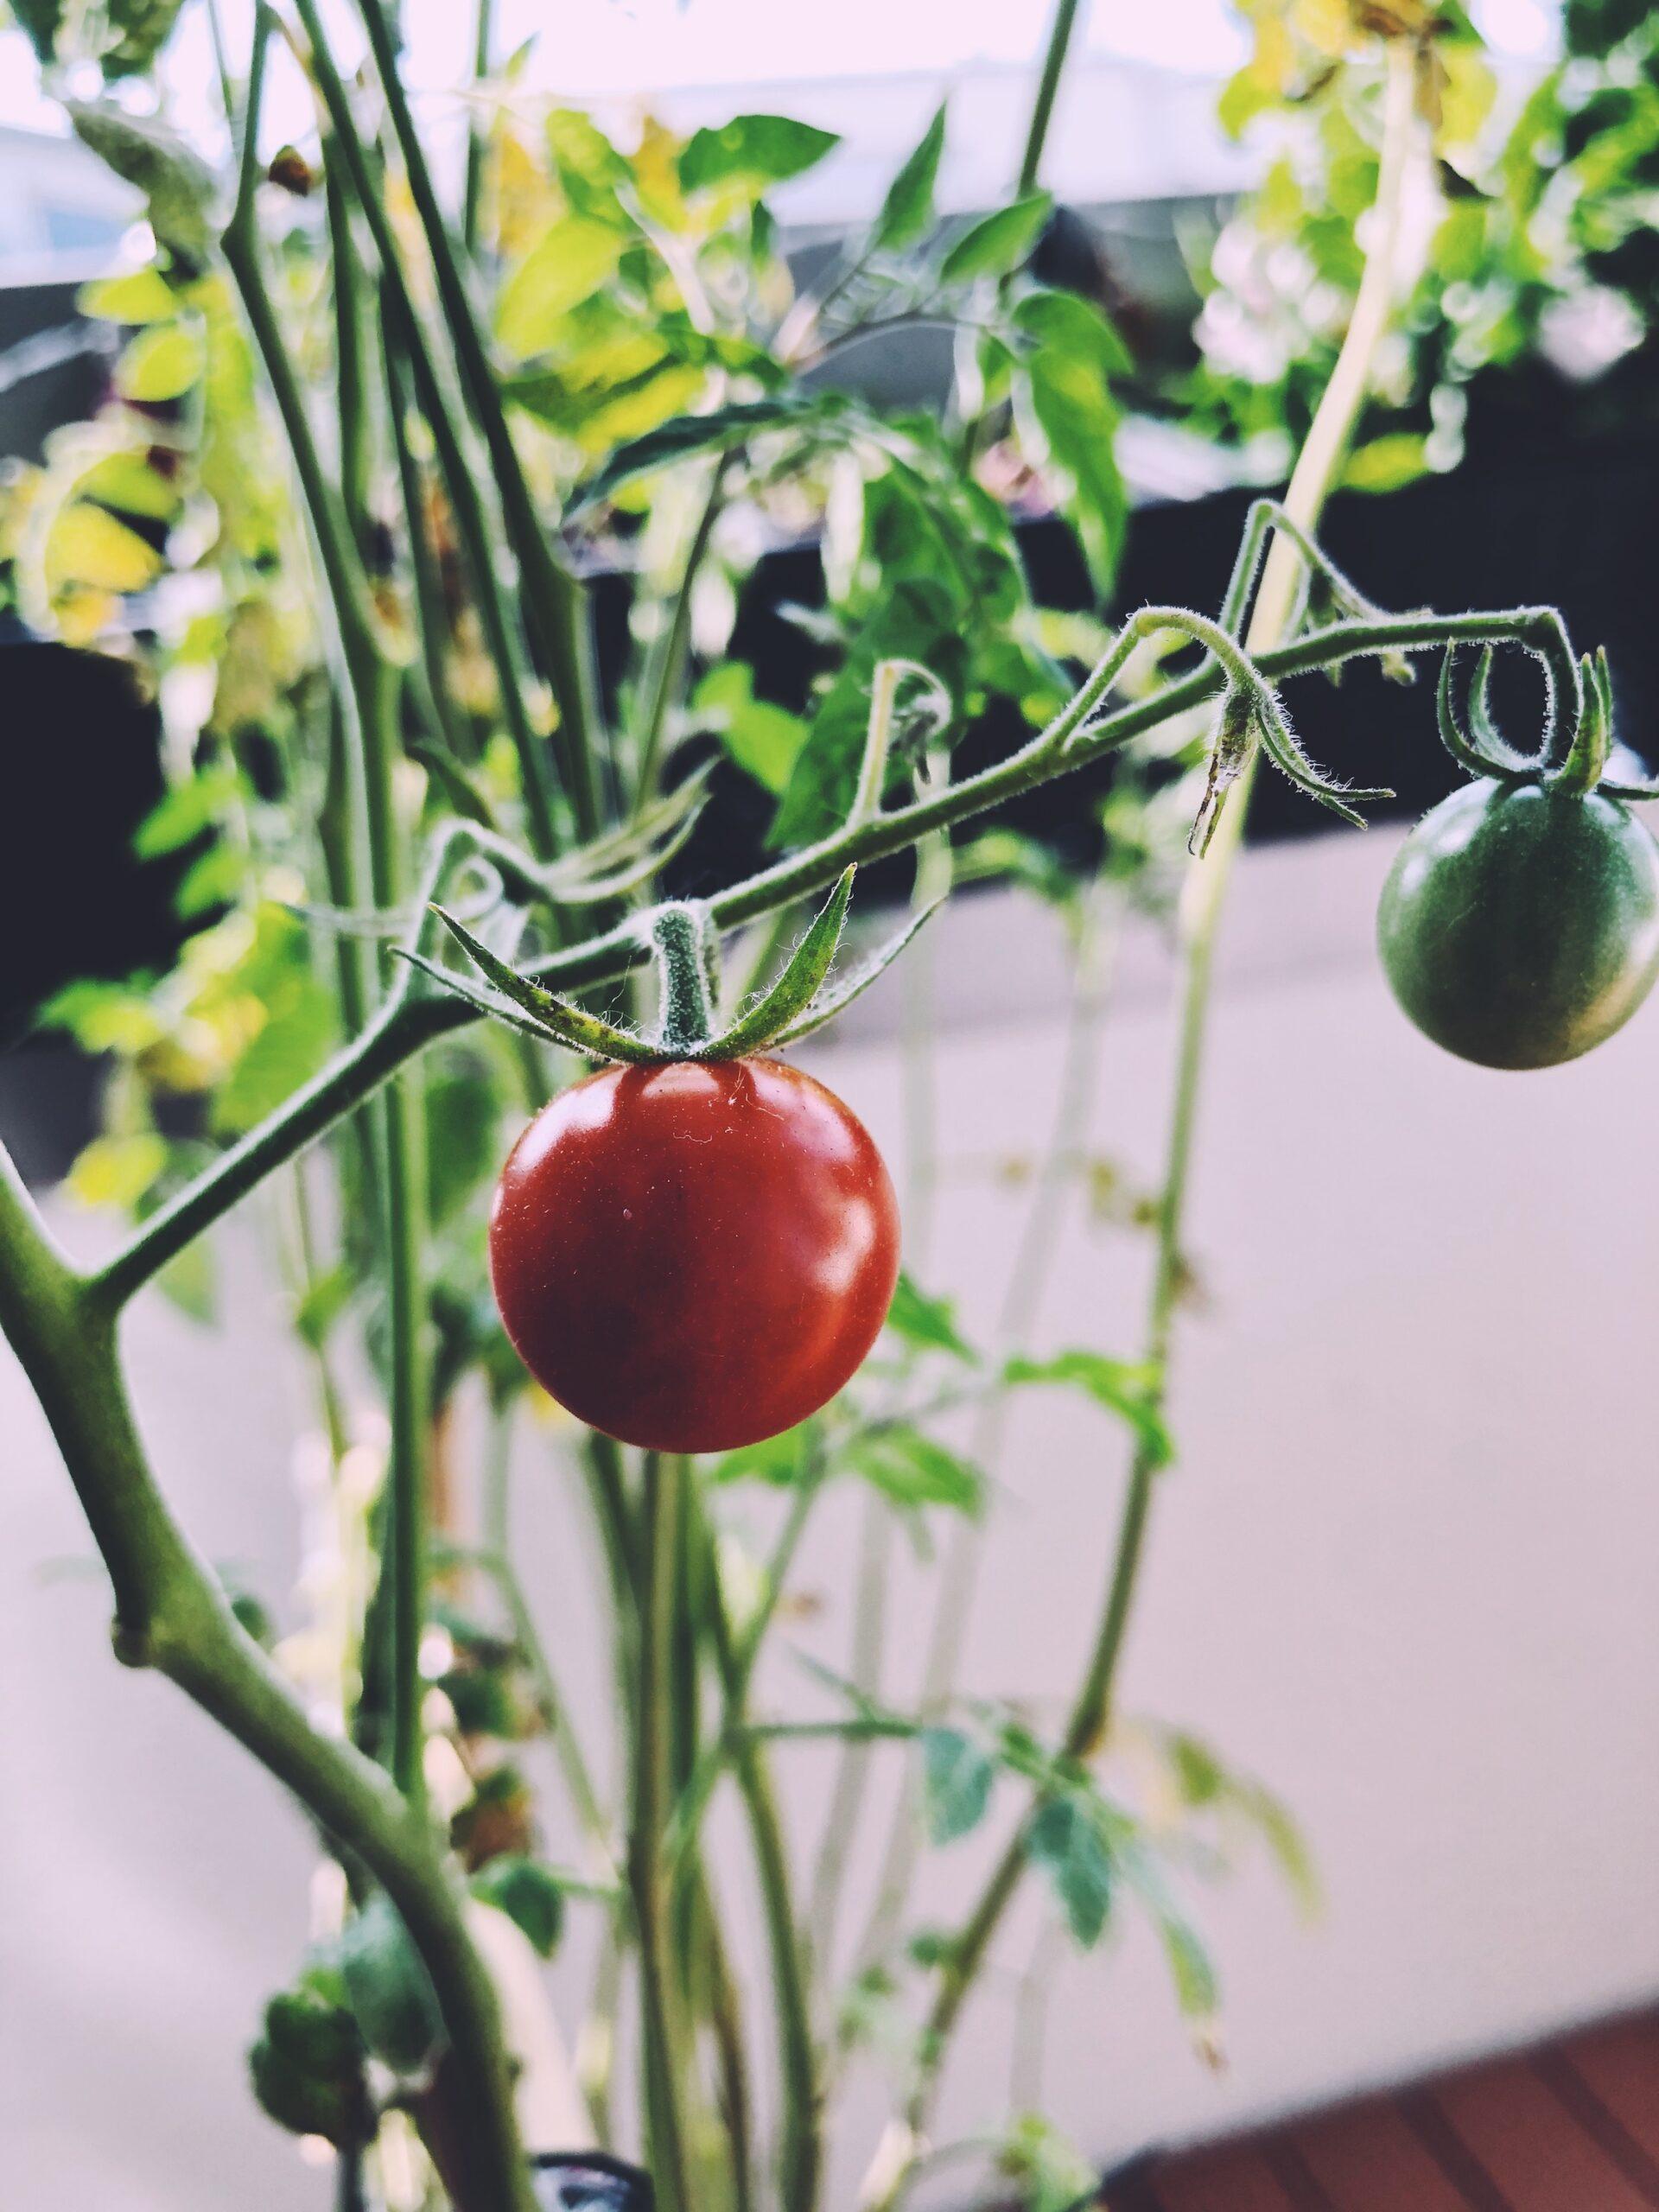 Cherry tomatoes in the urban garden